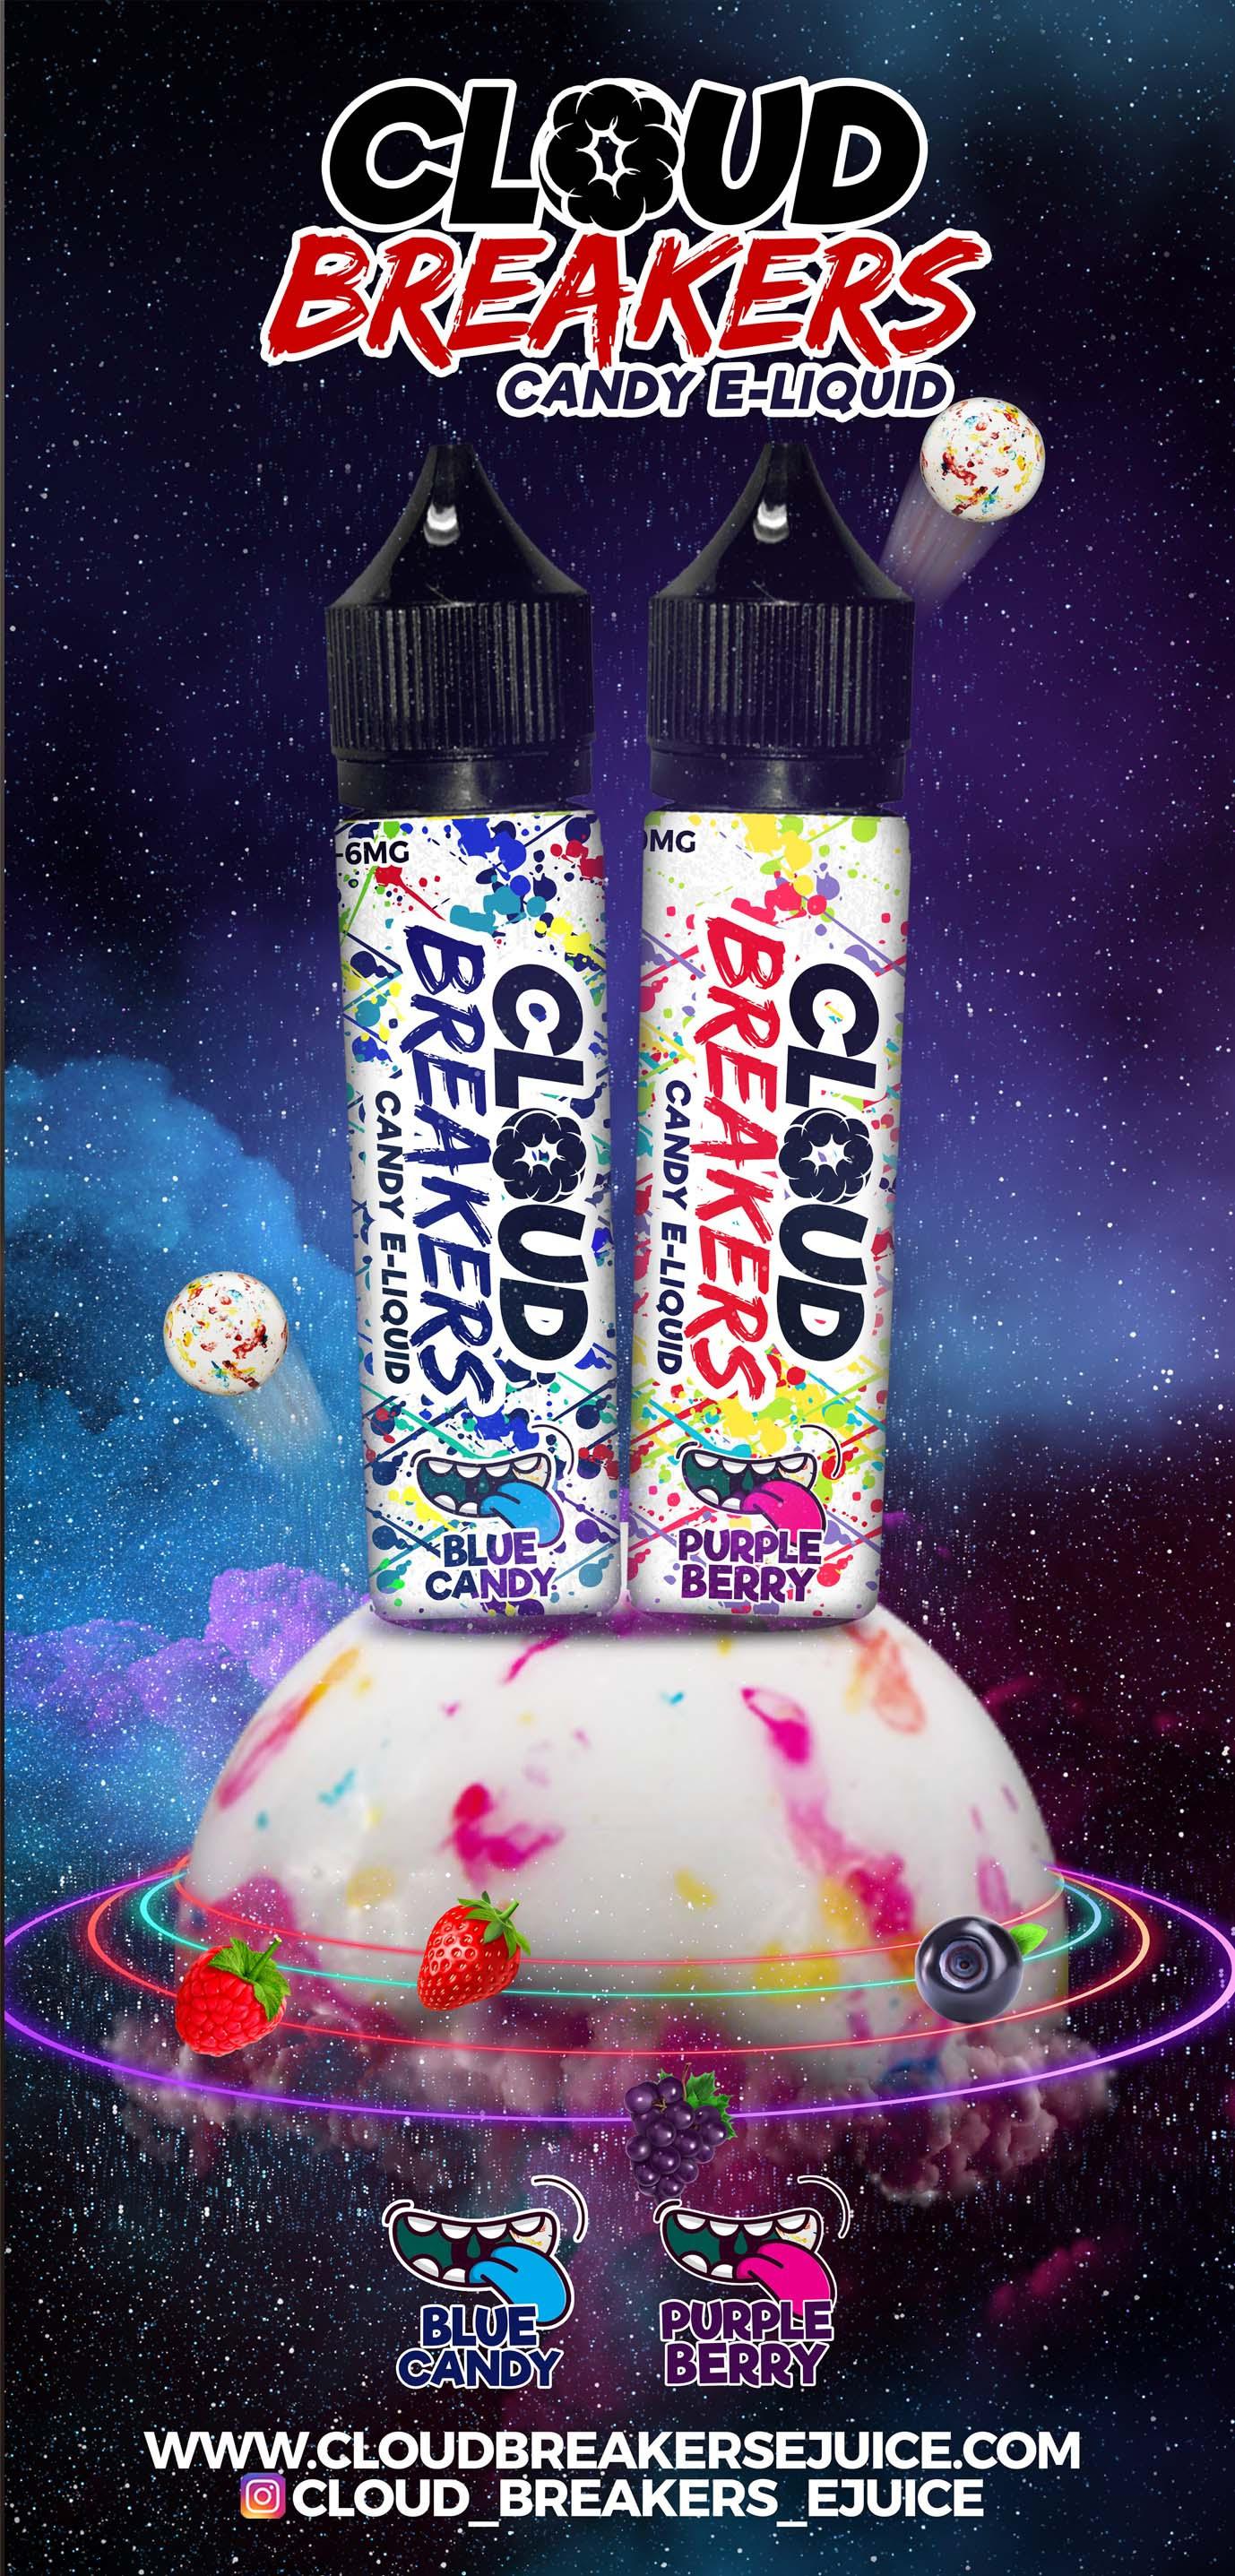 Cloud Breakers 60ml Vape Supplies Wh Crepe Eliquid Chocolate Hazelnut Usa Liquid